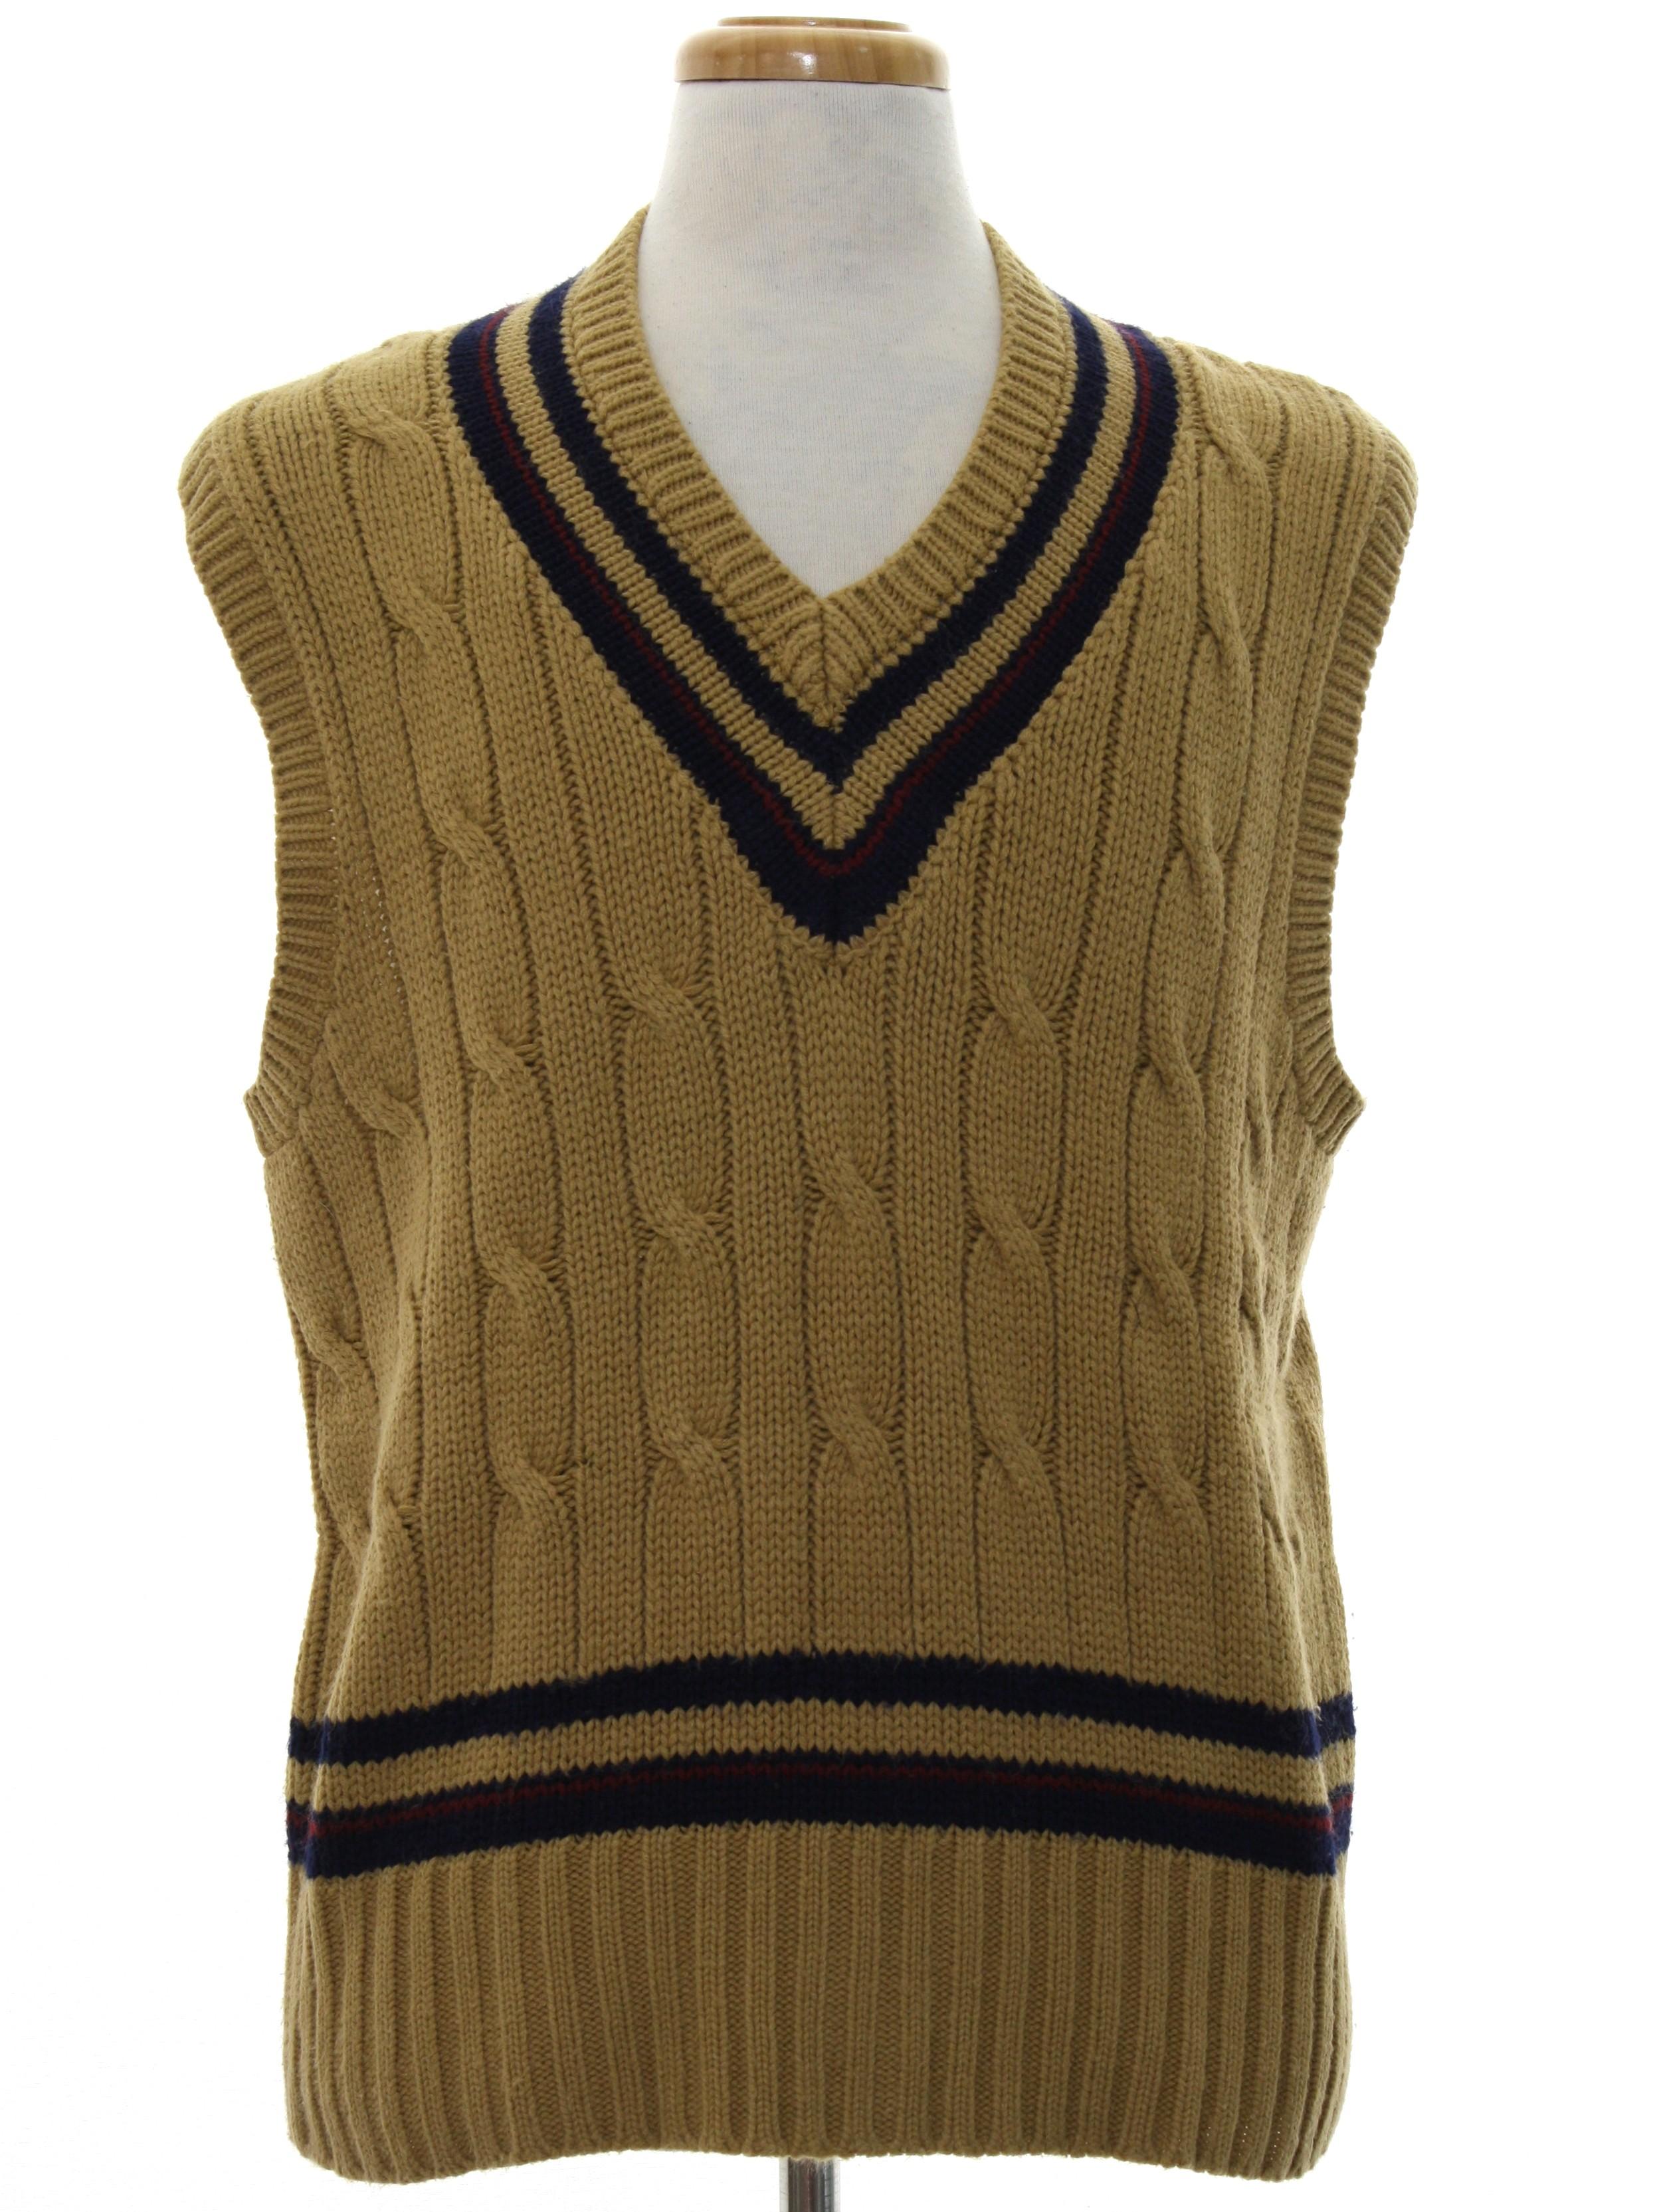 1980\u0027s Stephen Douglas by Forum Mens Totally 80s Preppy Sweater Vest